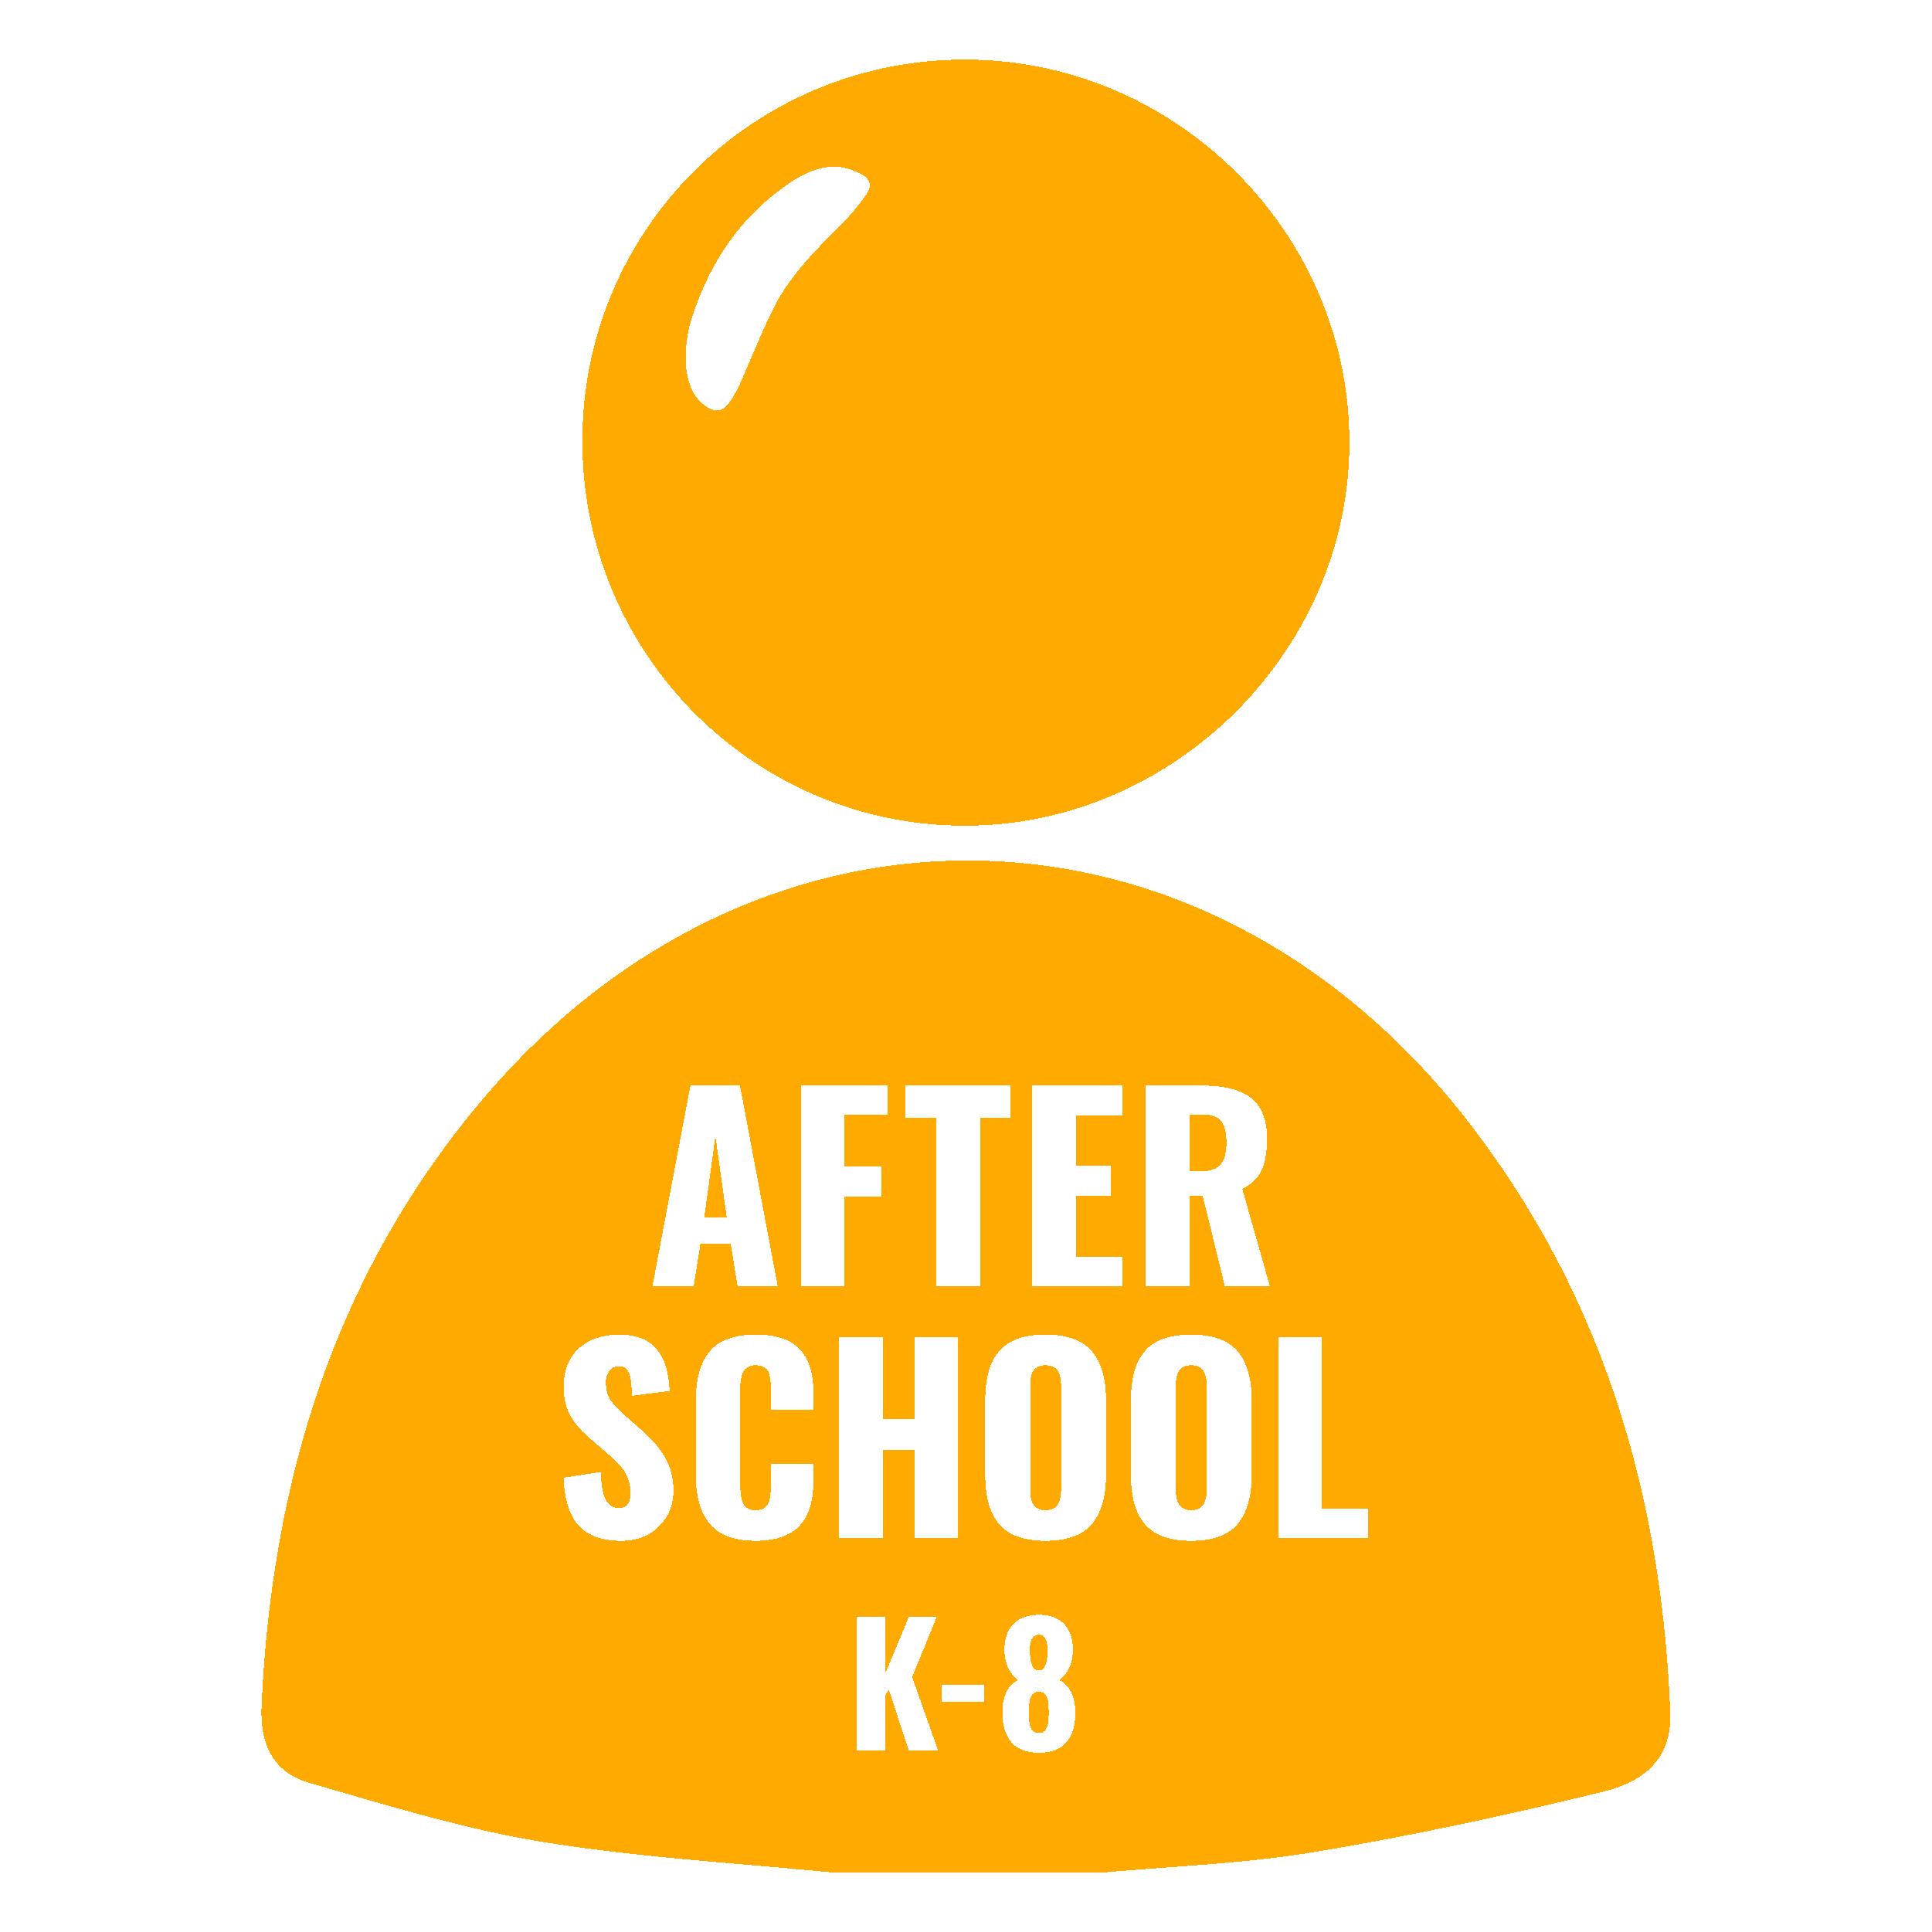 After School (K-8)